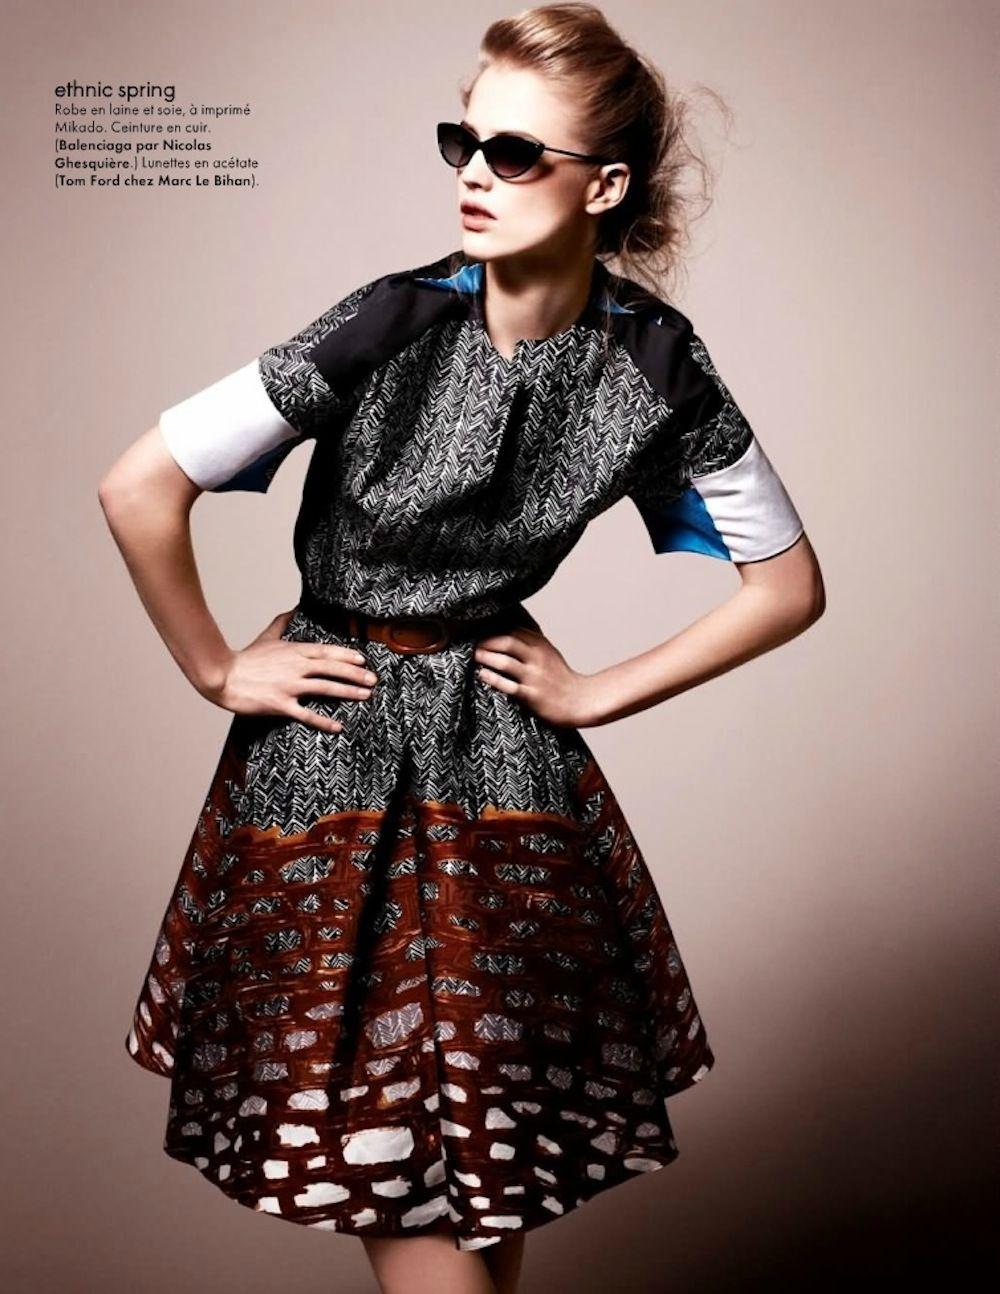 tribal fashion editorials | visual optimism; fashion editorials, shows, campaigns & more!: tribal ...